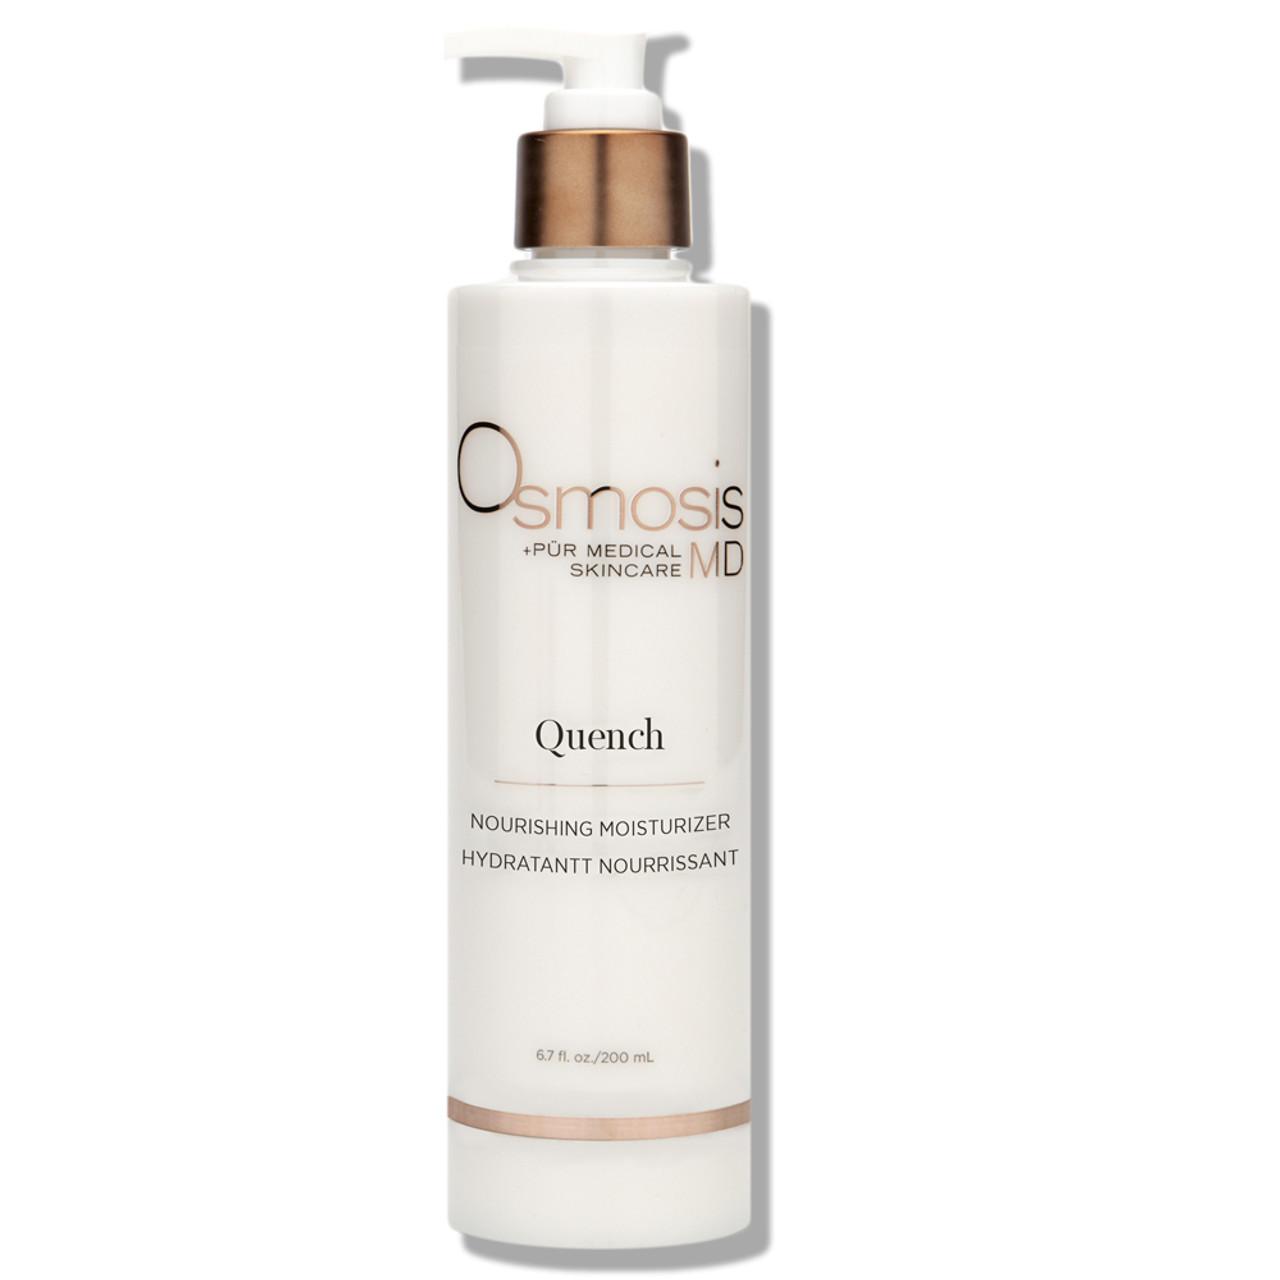 Osmosis +Skincare MD Quench - Nourishing Moisturizer BeautifiedYou.com